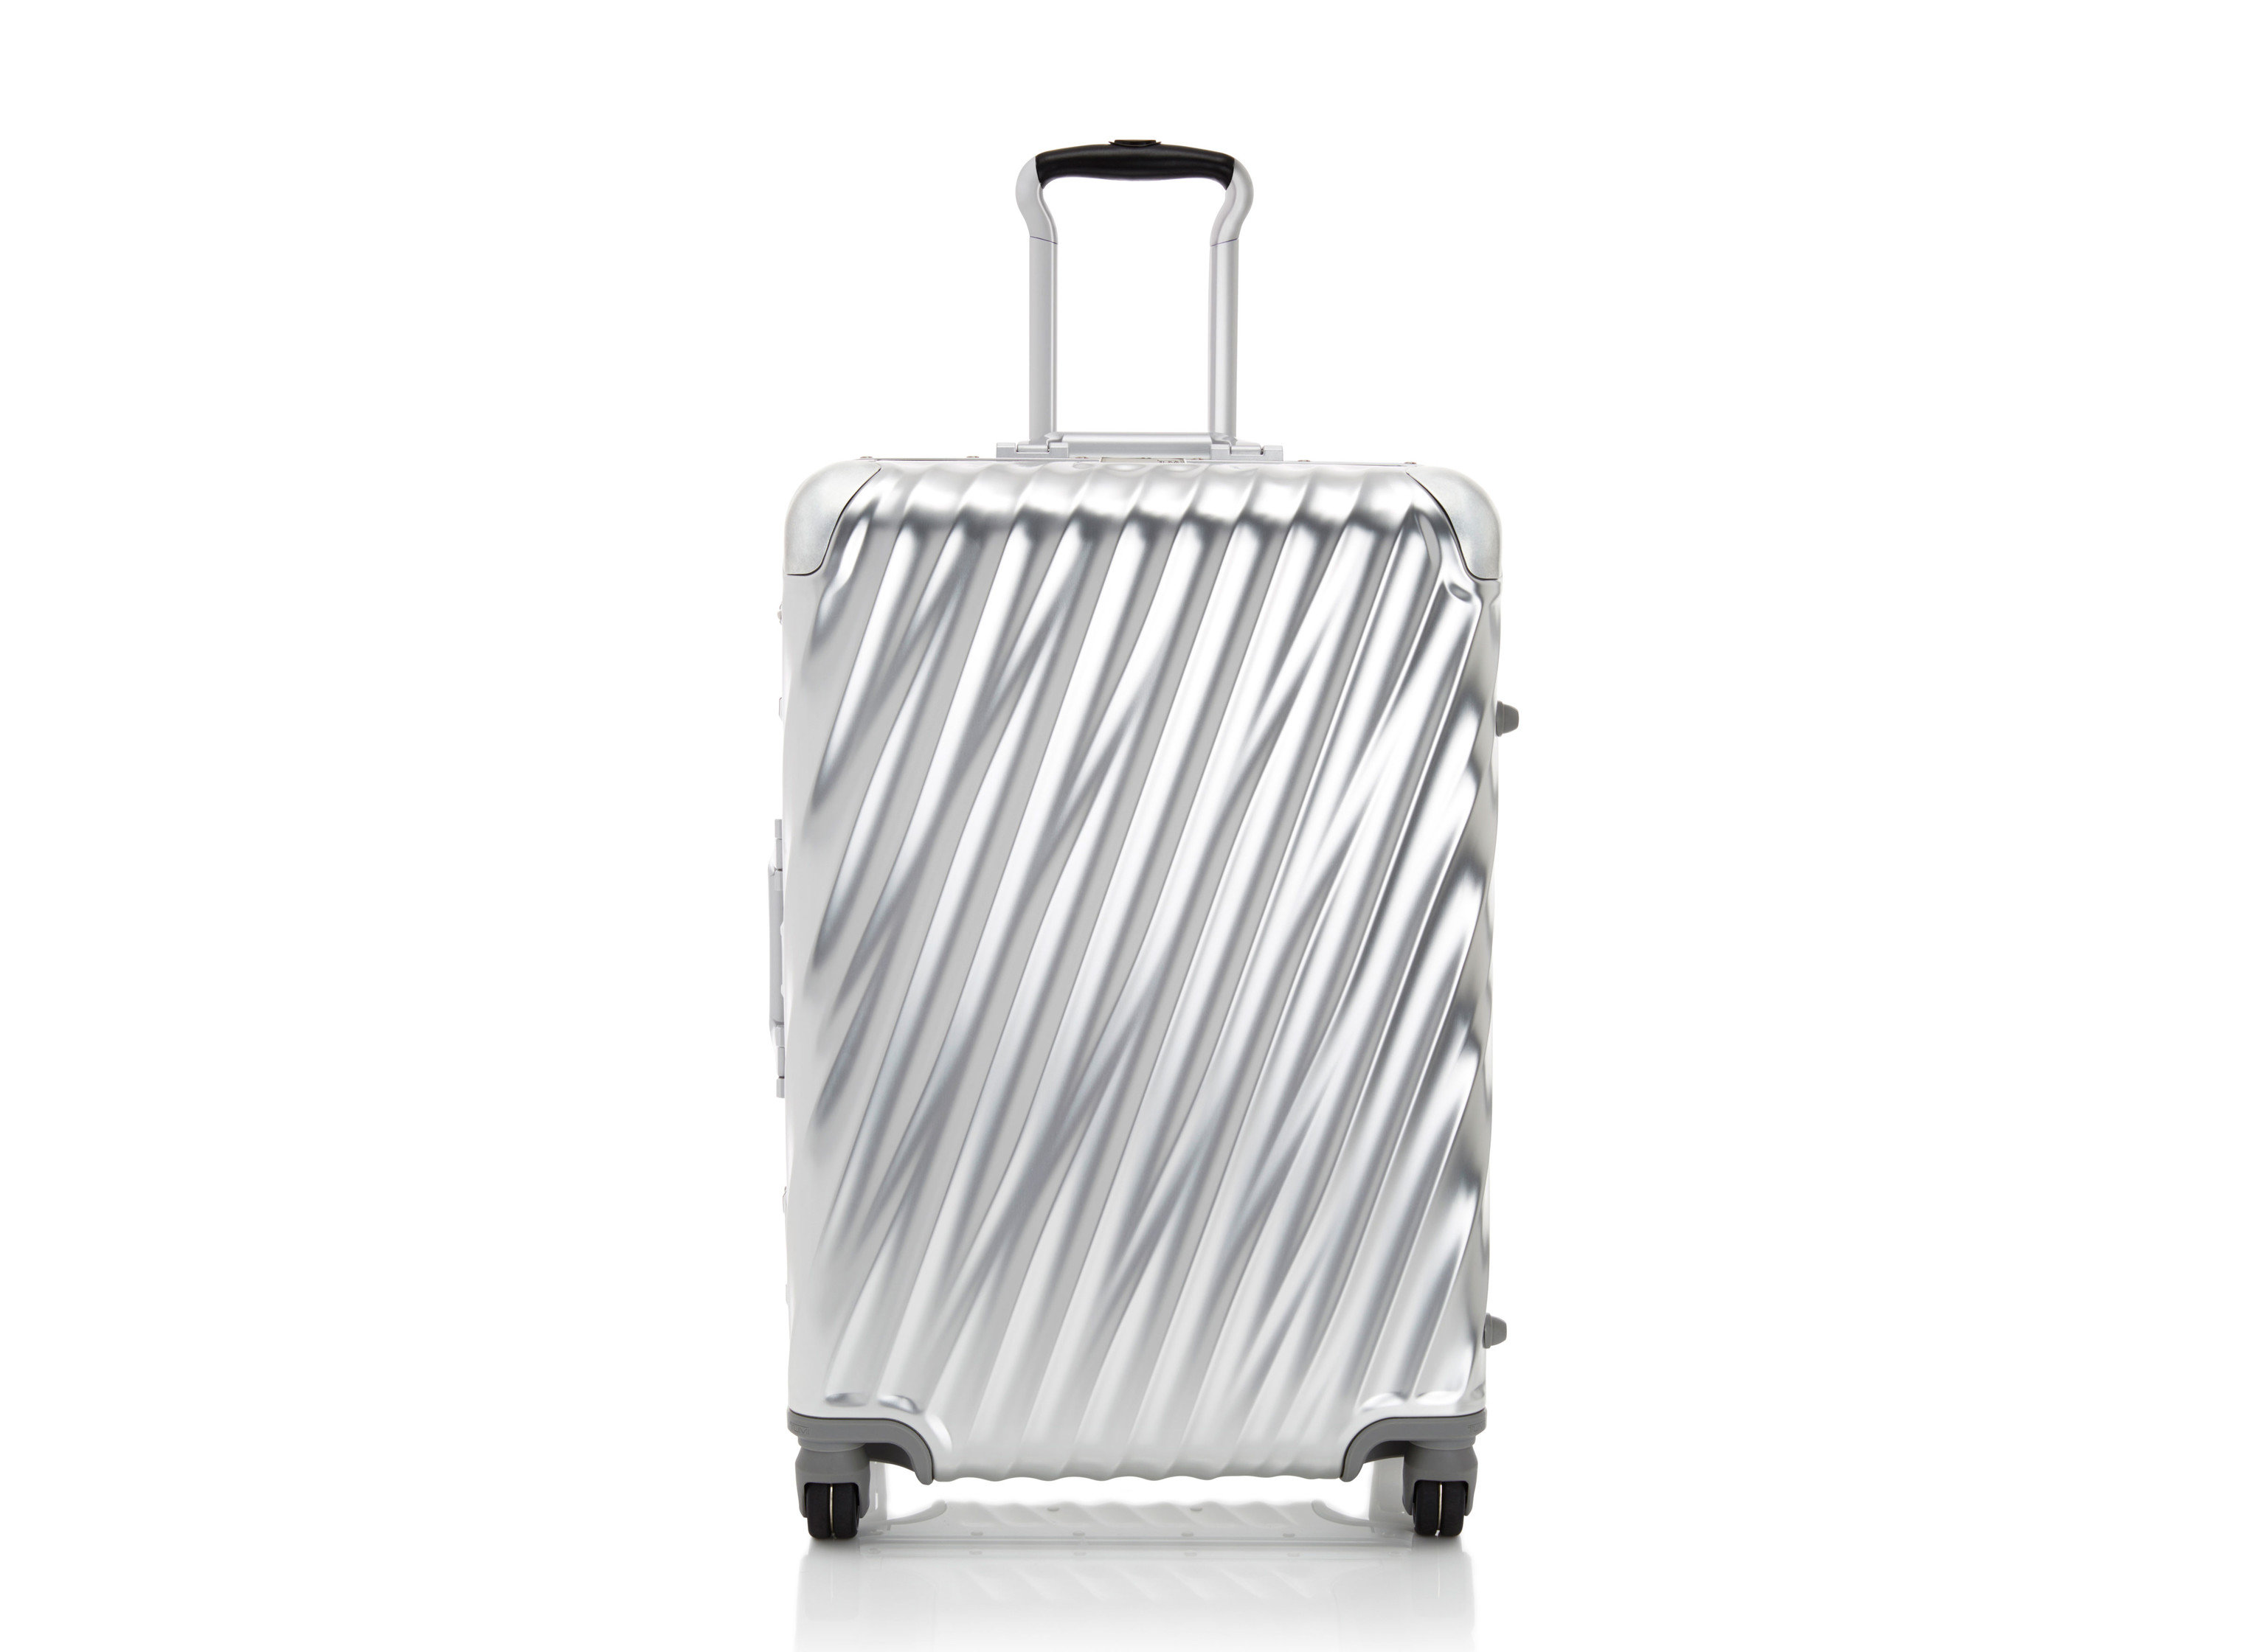 Style + Design product suitcase hand luggage